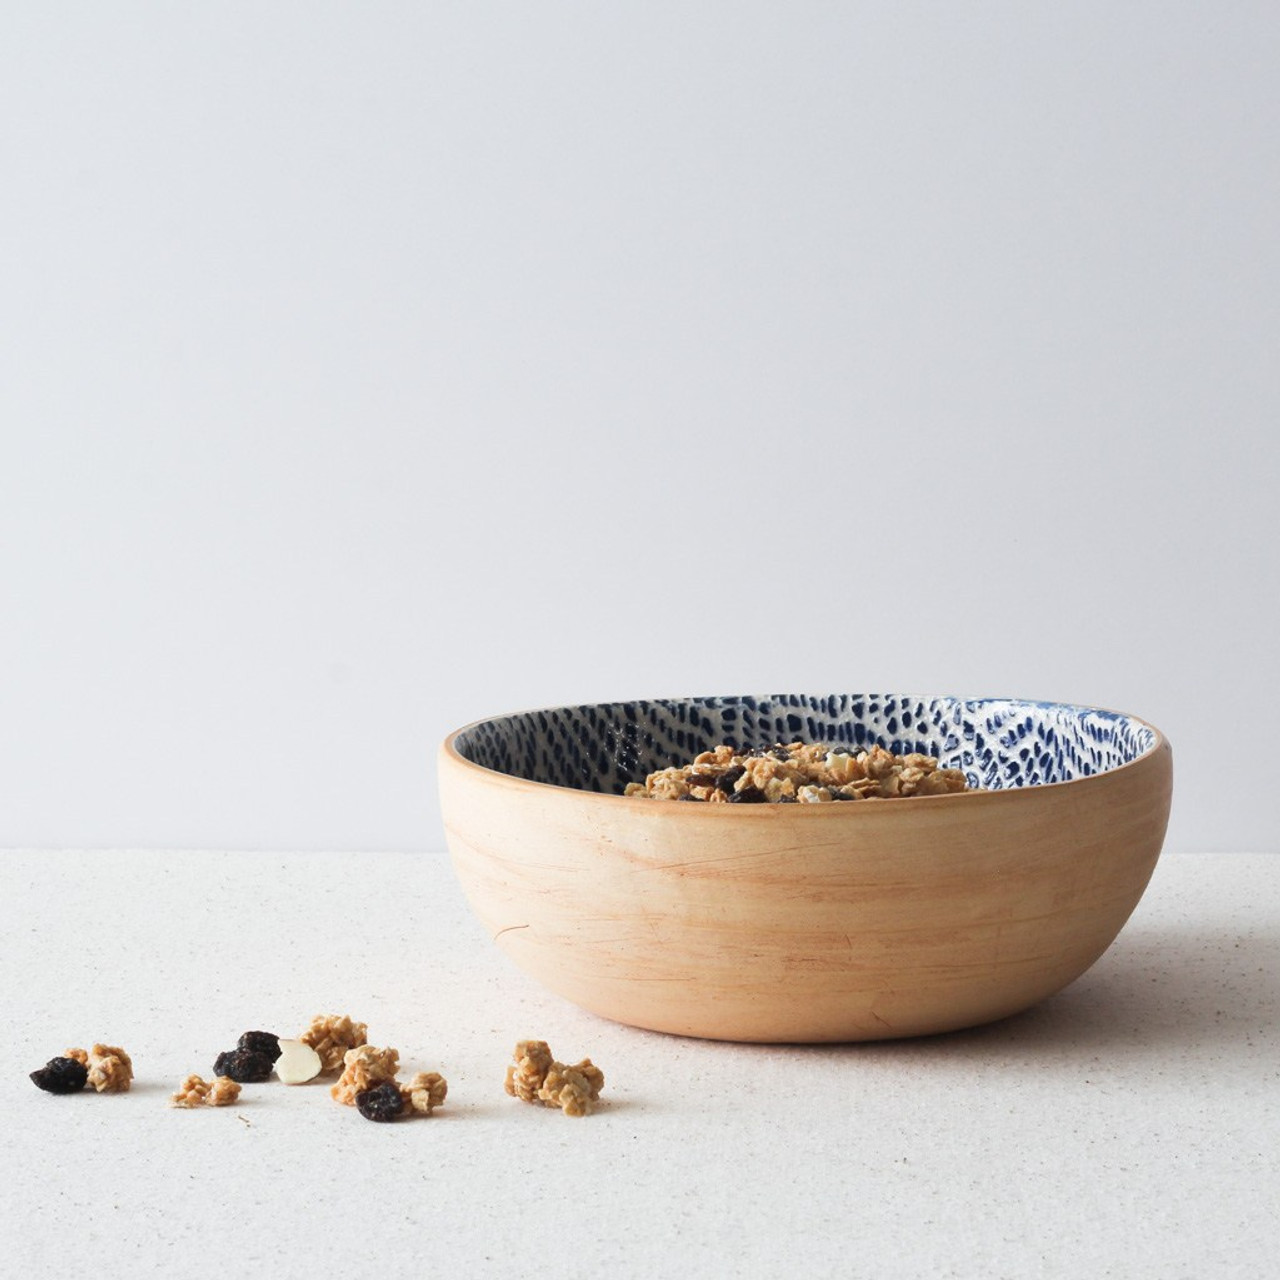 Terrafirma Ceramics Small Coupe Bowl (Cobalt/Taj) with Granola